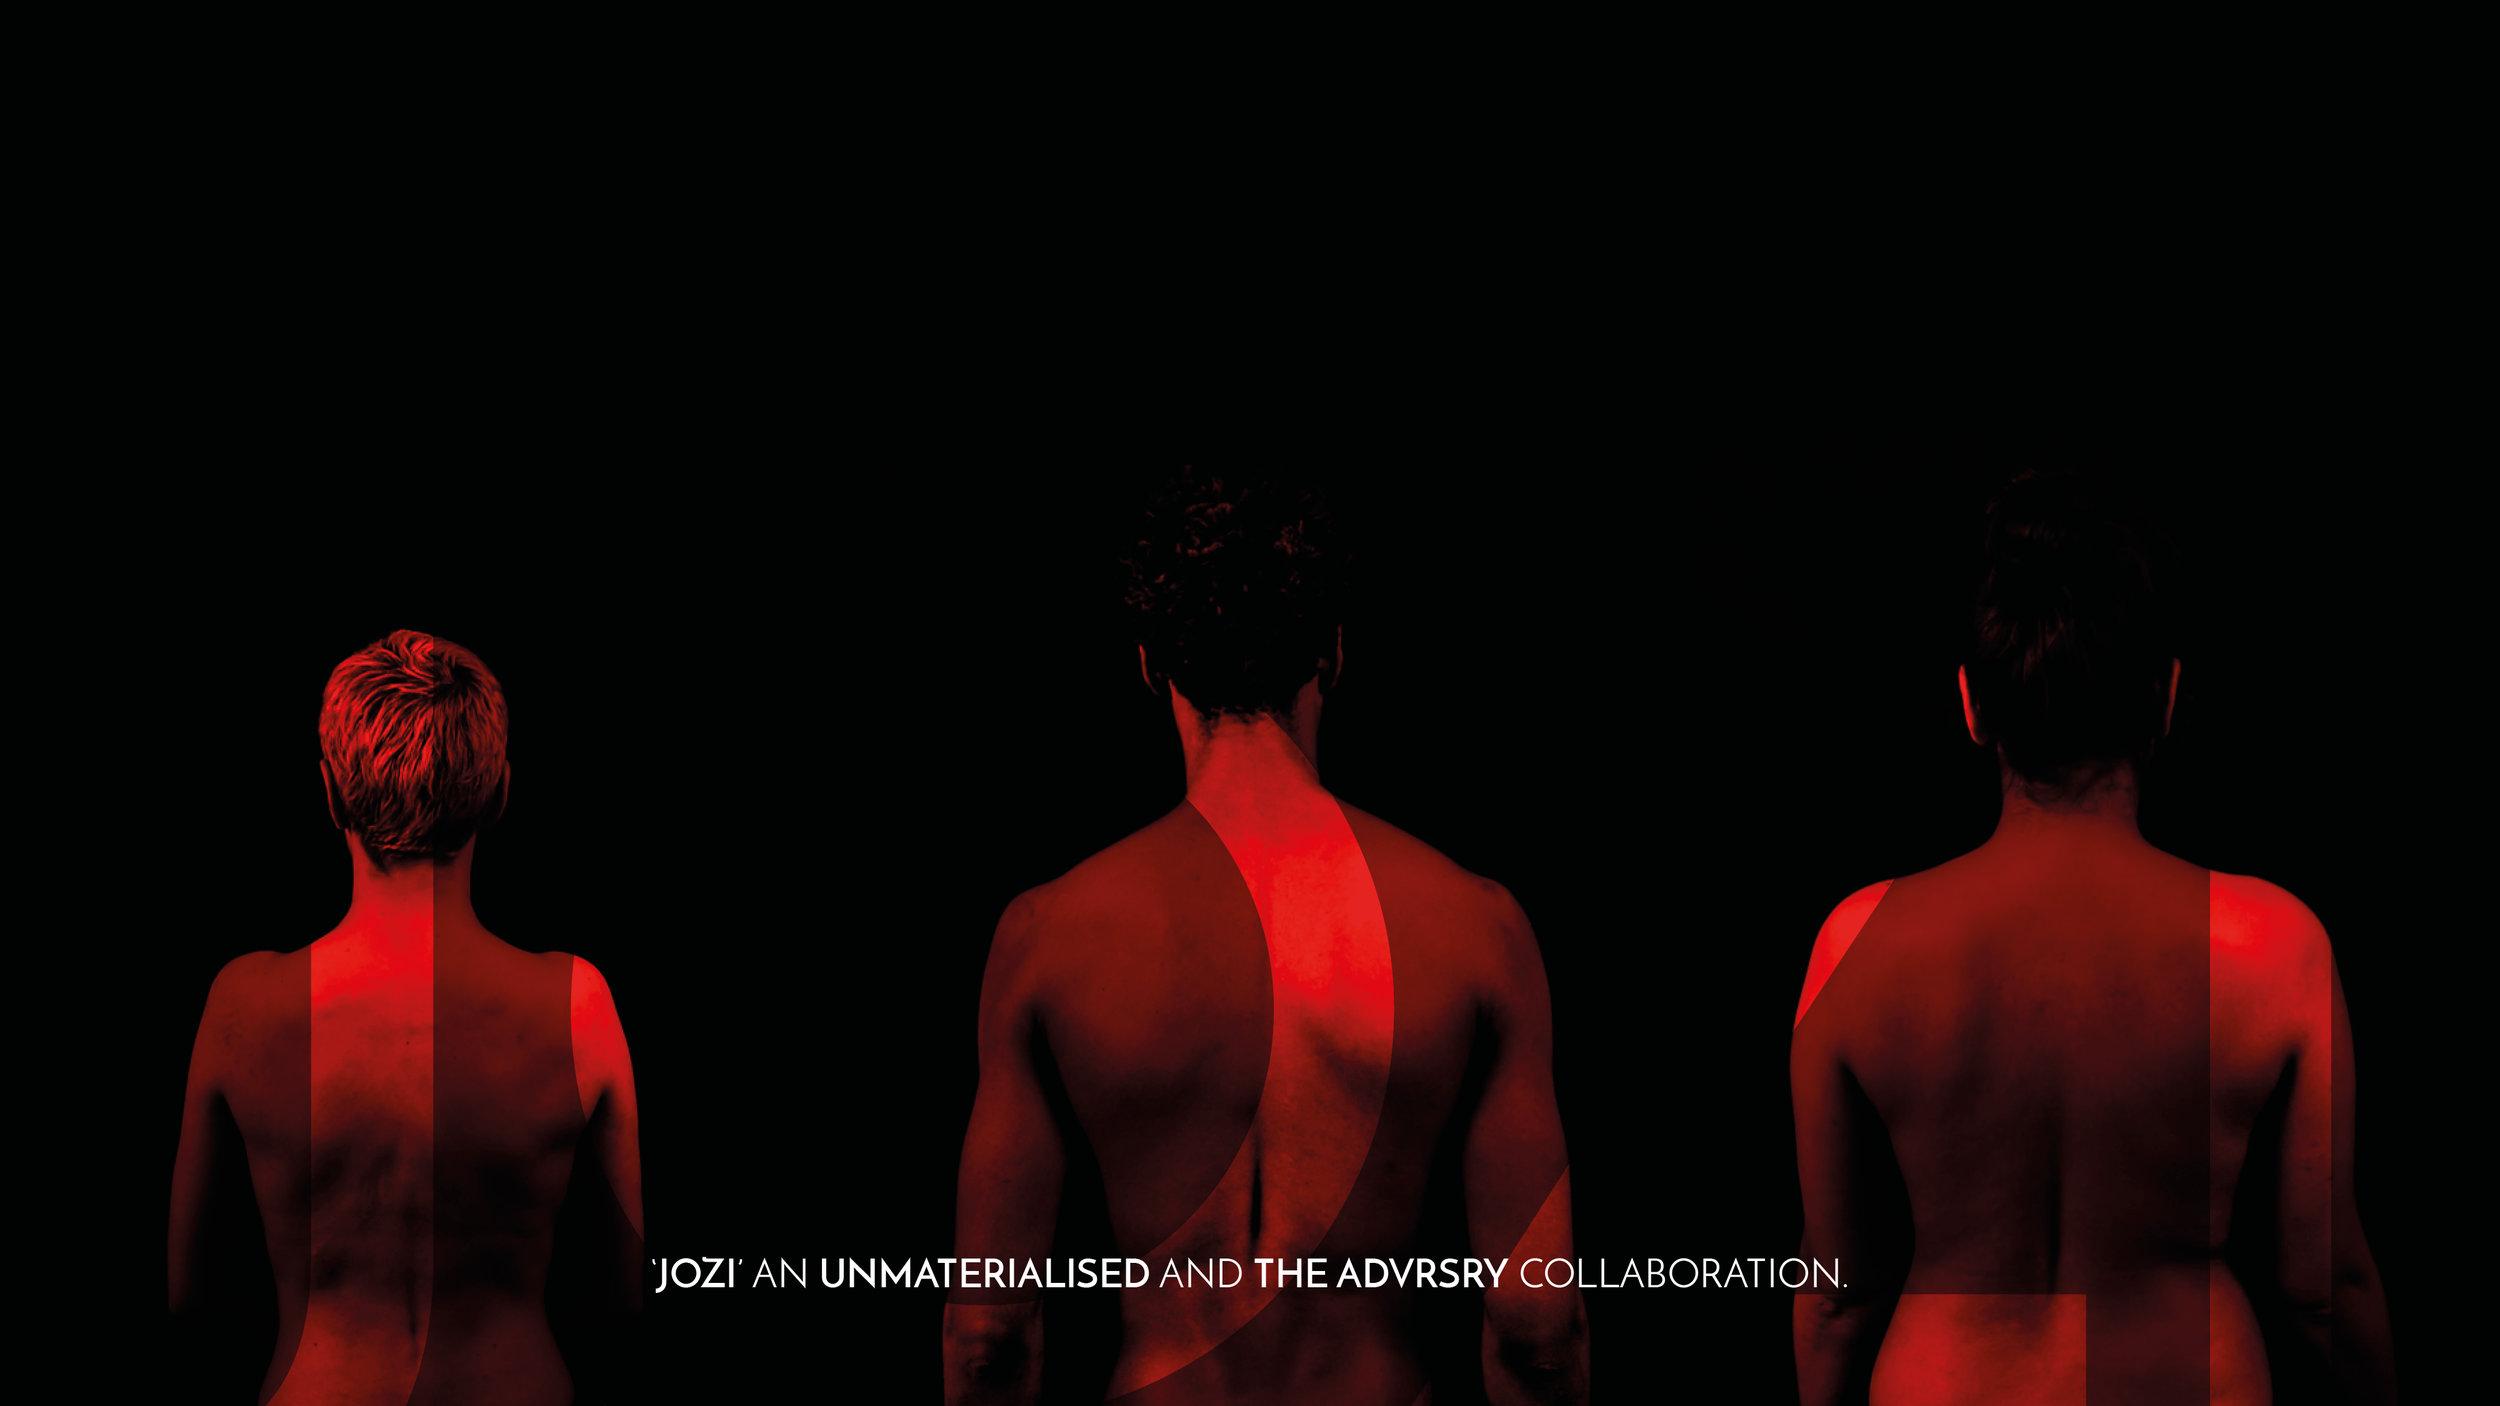 Jozi (Unmaterialised & The Advrsry).jpg